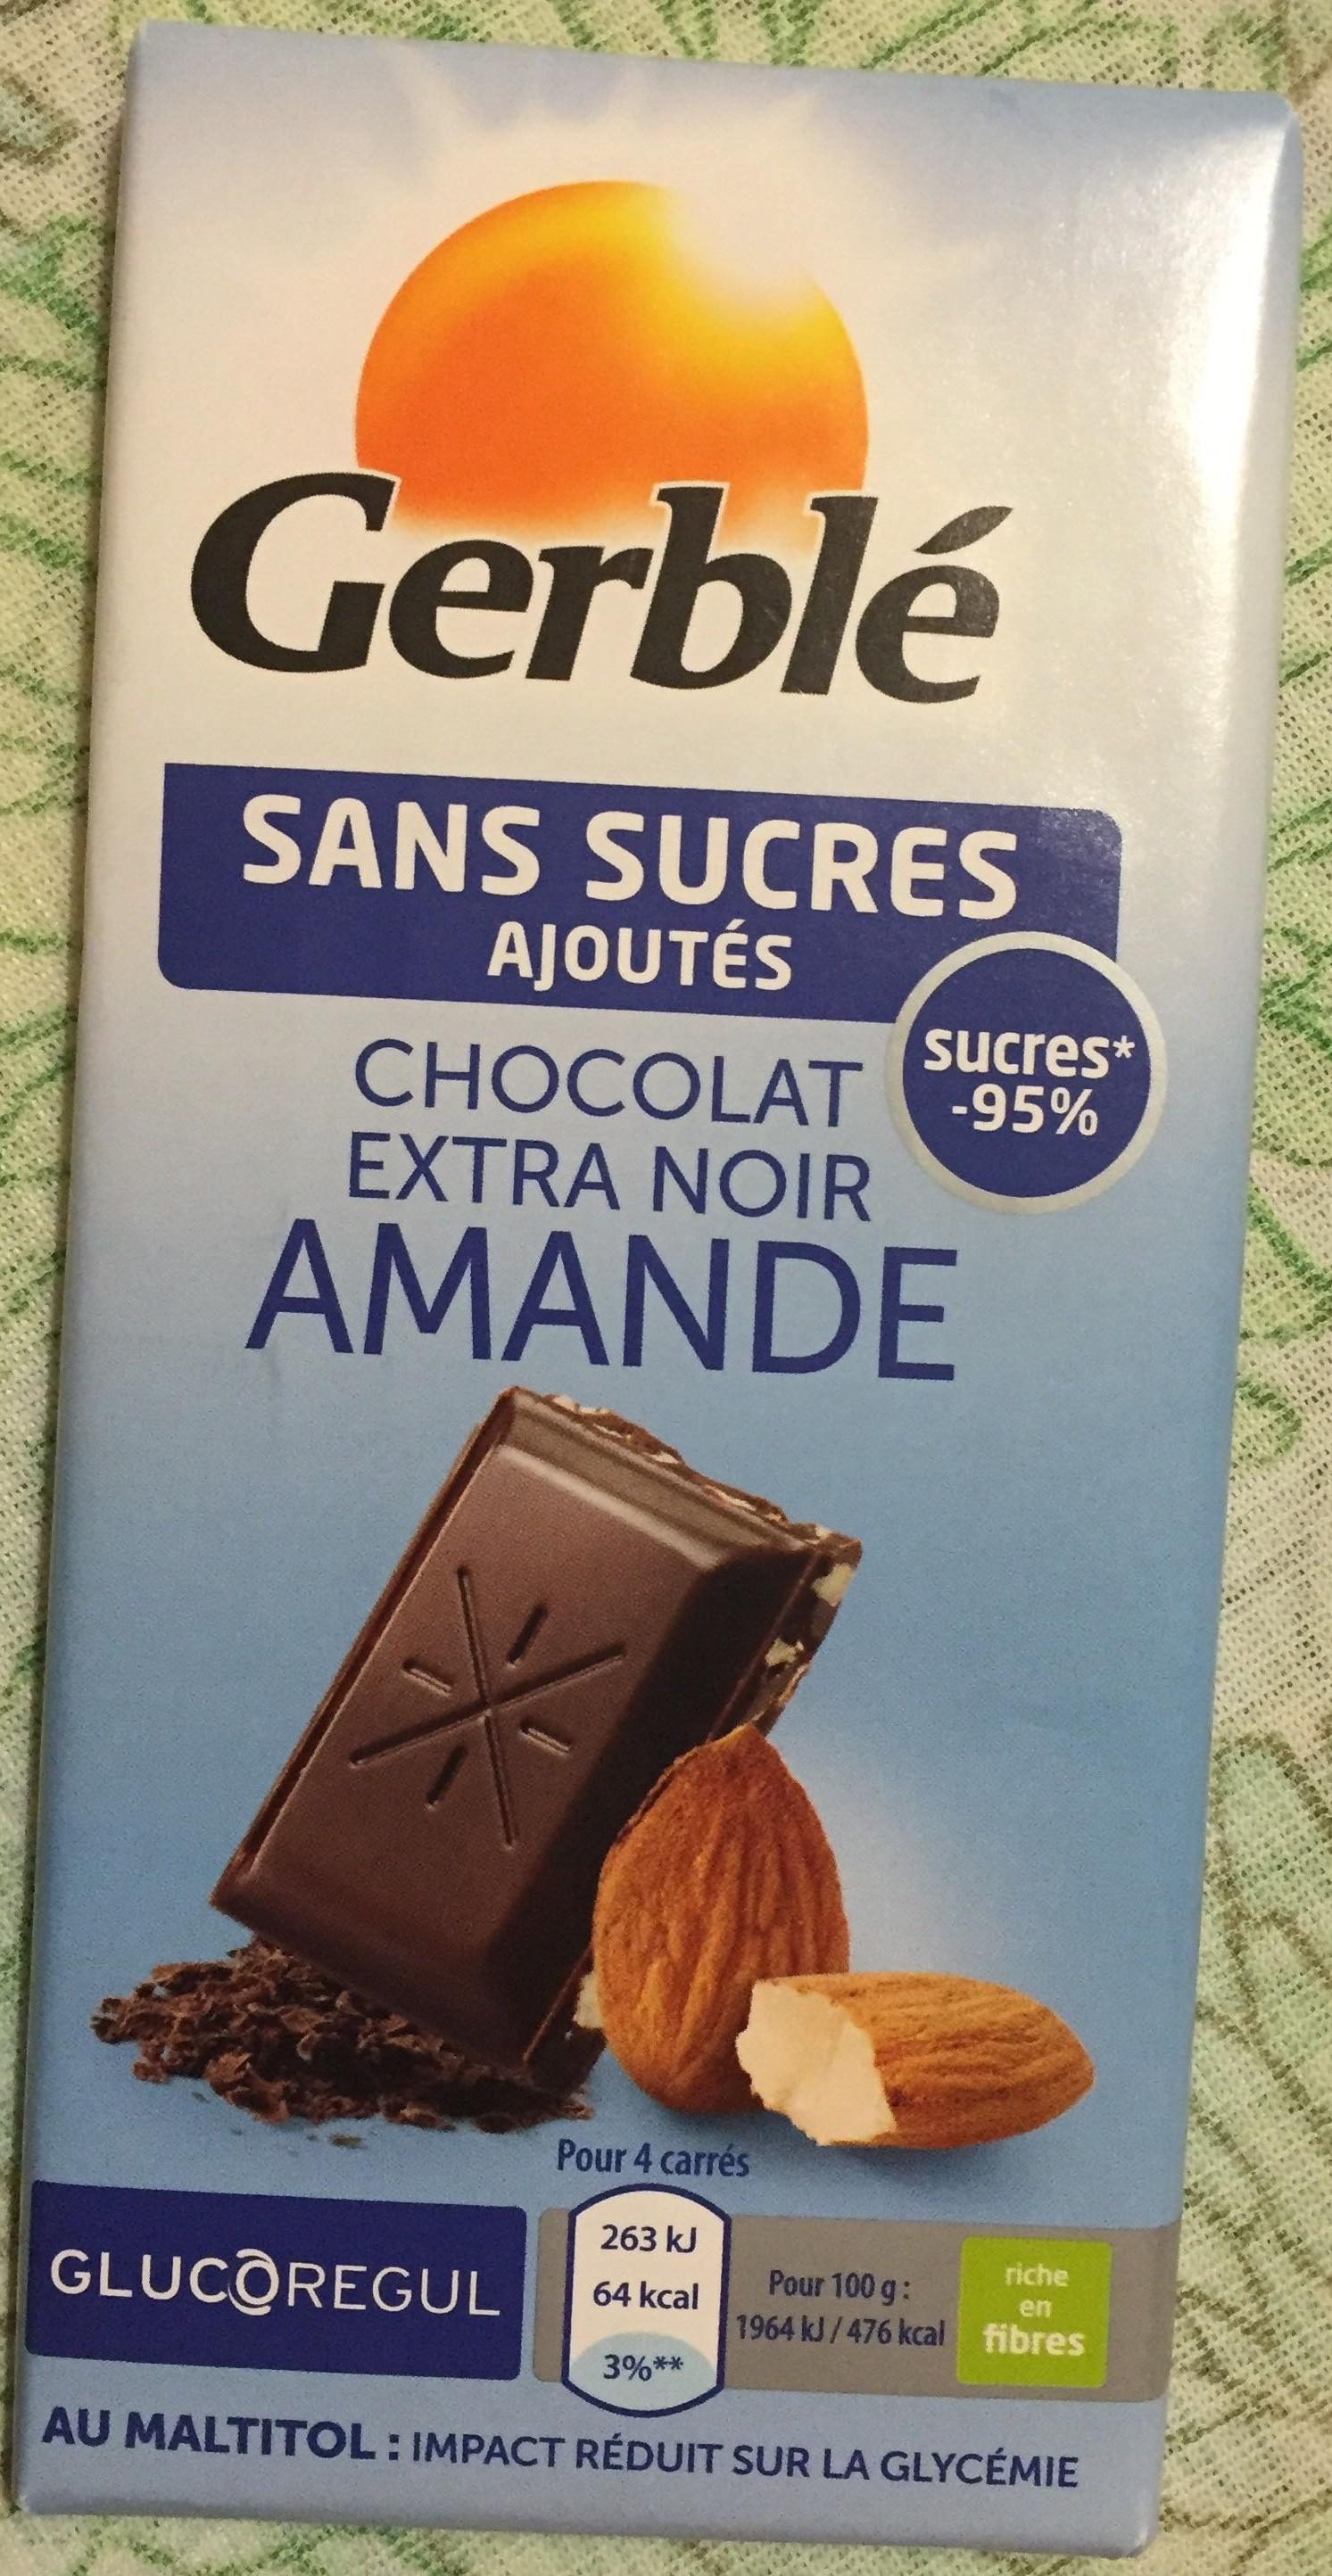 Chocolat extra noir amande - Product - fr